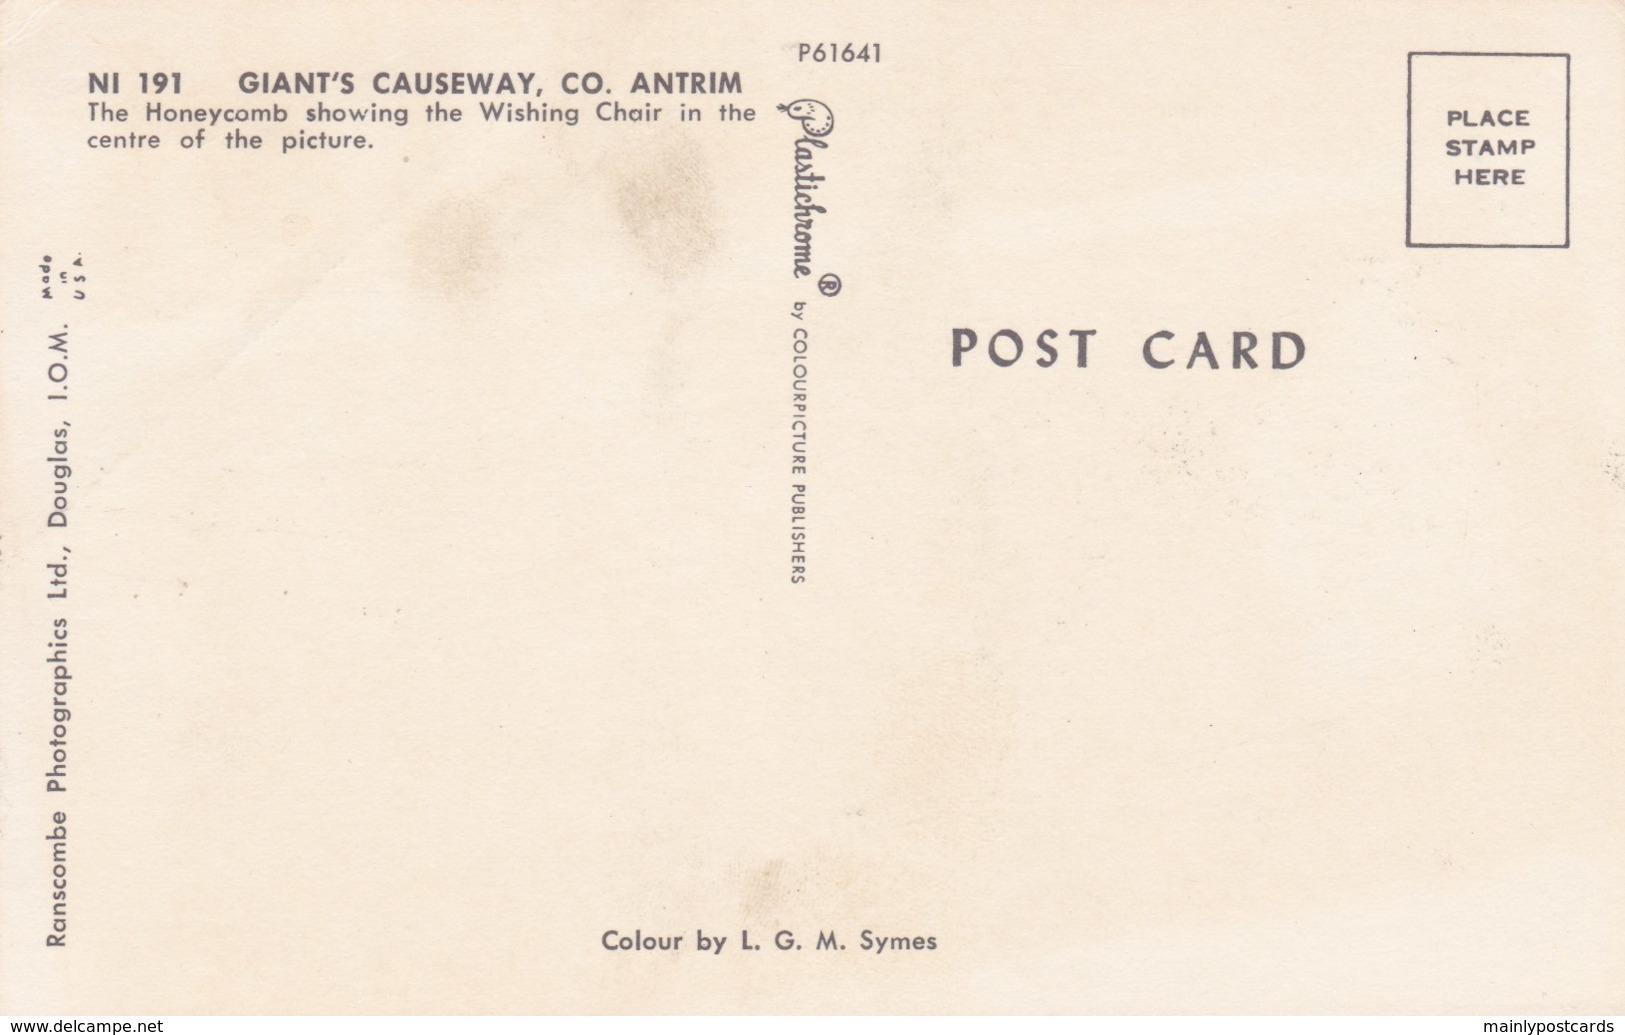 AM36 Giant's Causeway, Co. Antrim - Antrim / Belfast